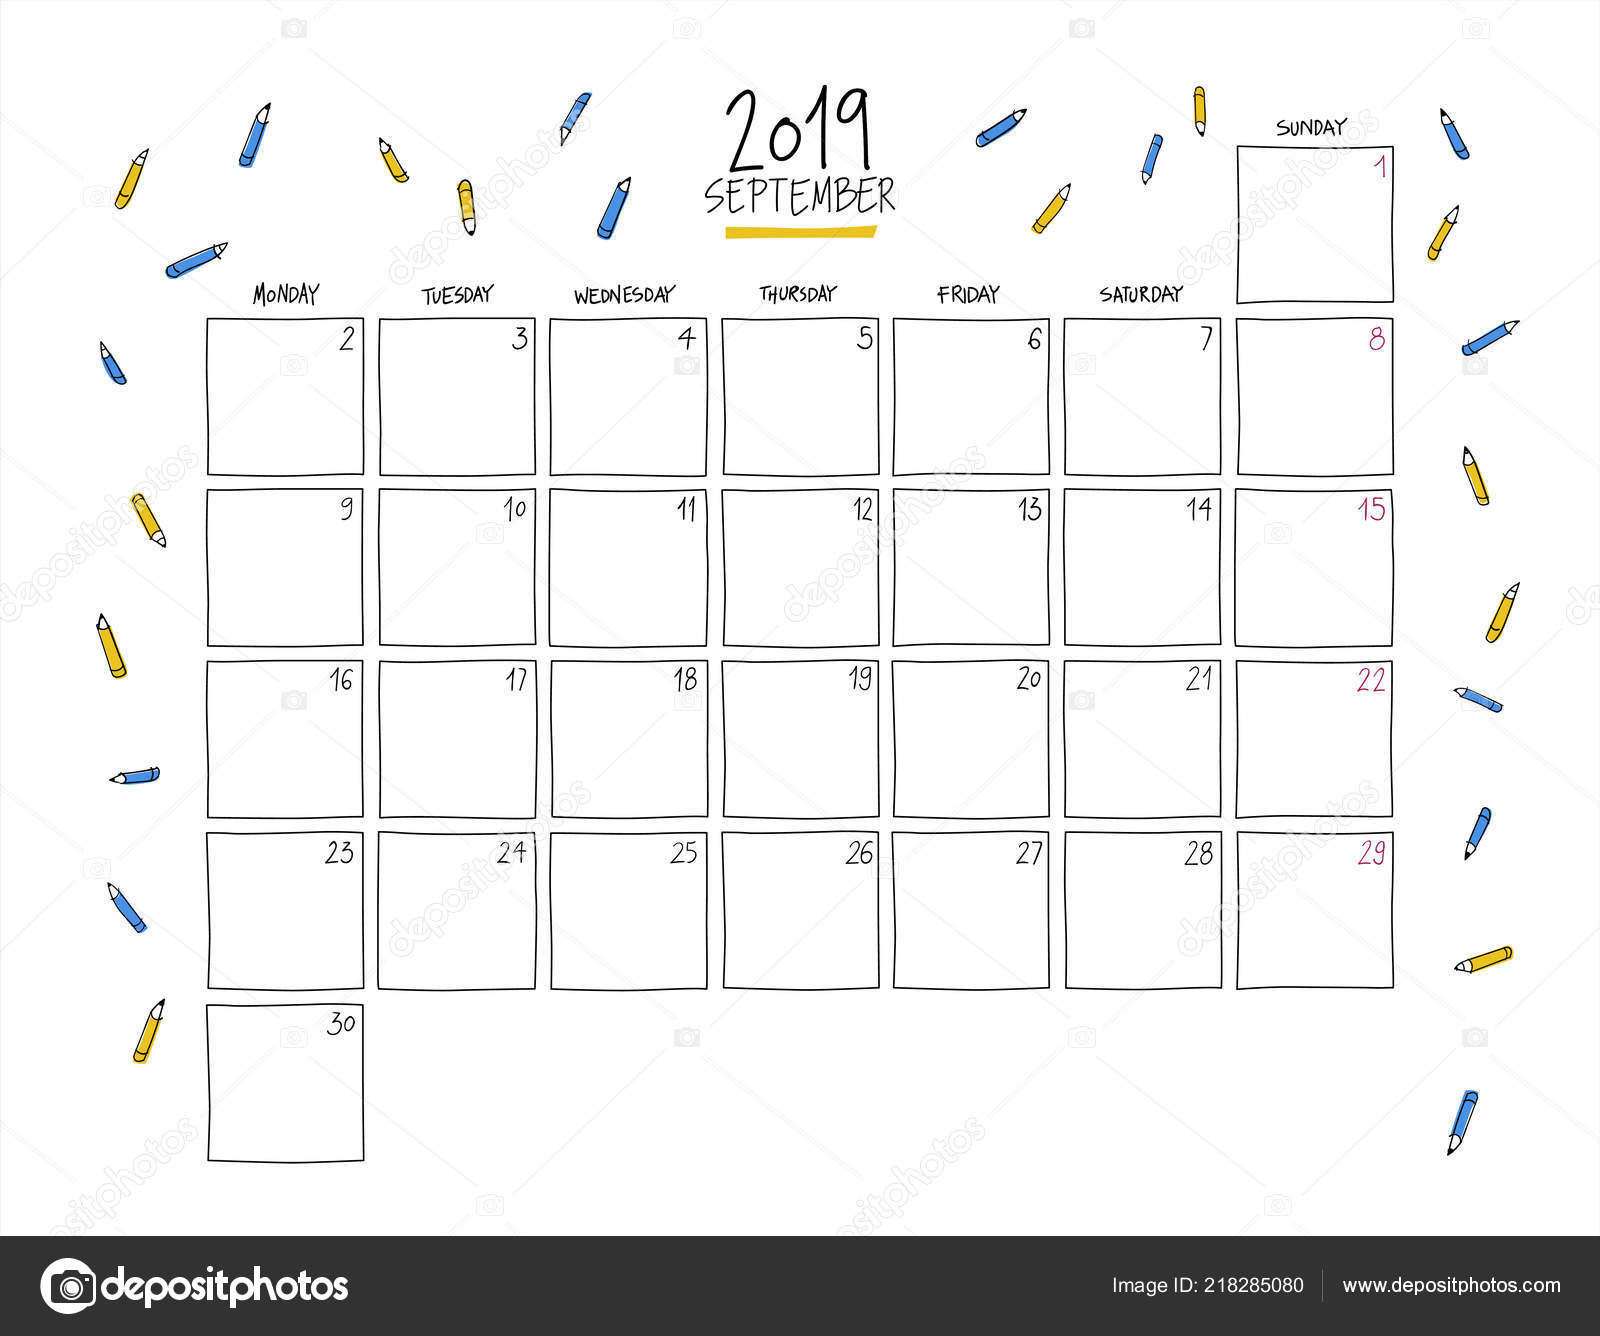 Calendario Dibujo Septiembre.Calendario Pared Septiembre 2019 Plantilla Horizontal Dibujo